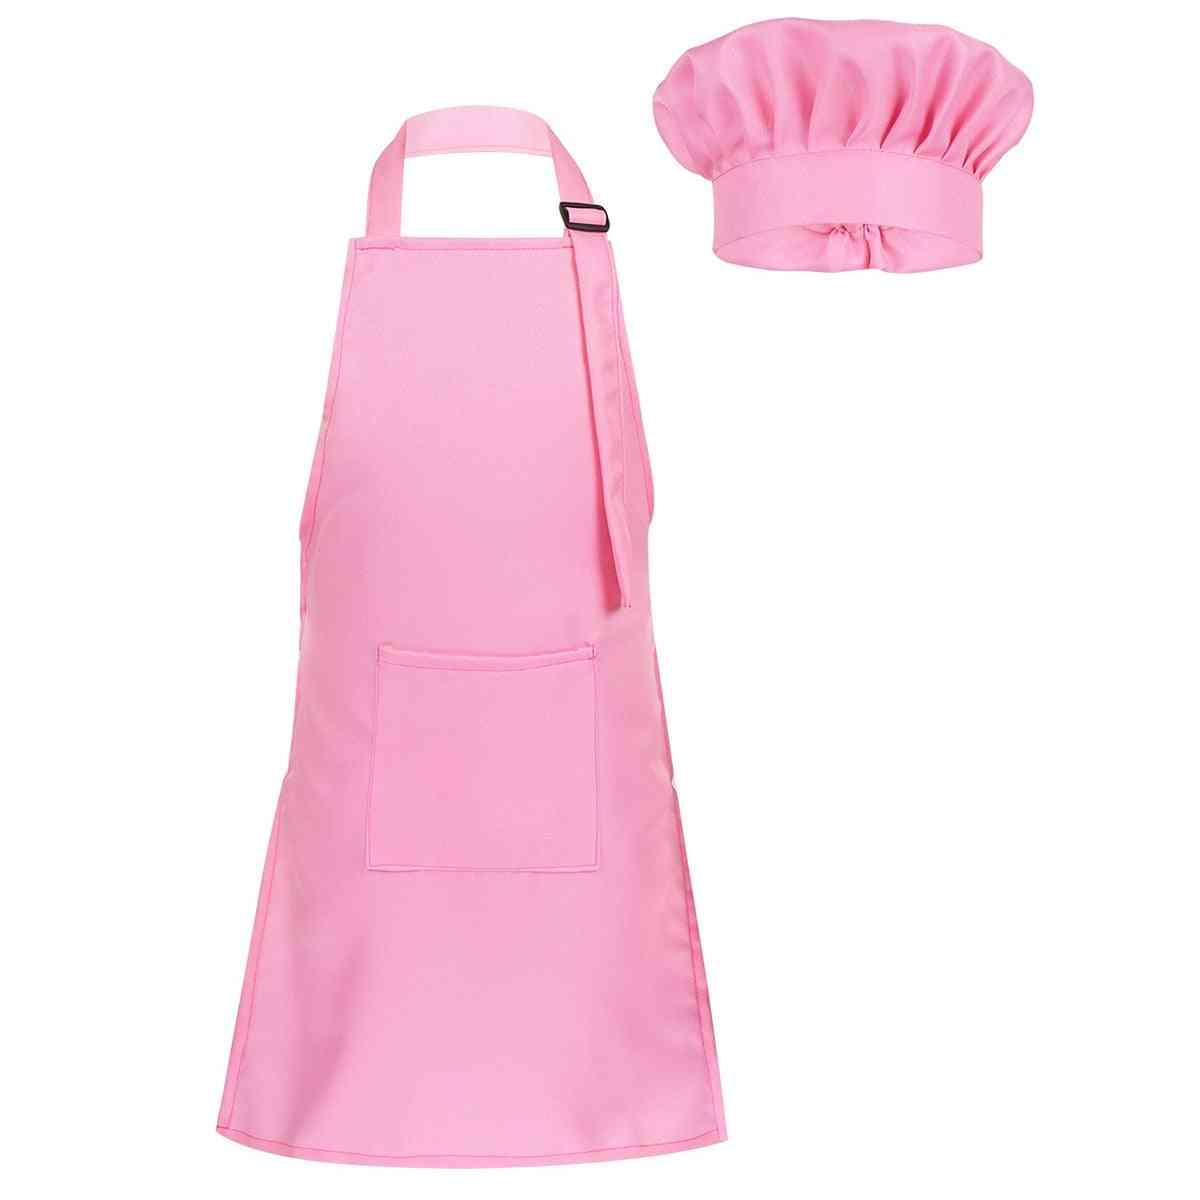 Child Kids Adjustable Apron And Chef Hat Set Kitchen Cooking Uniform Baking Painting Training Wear